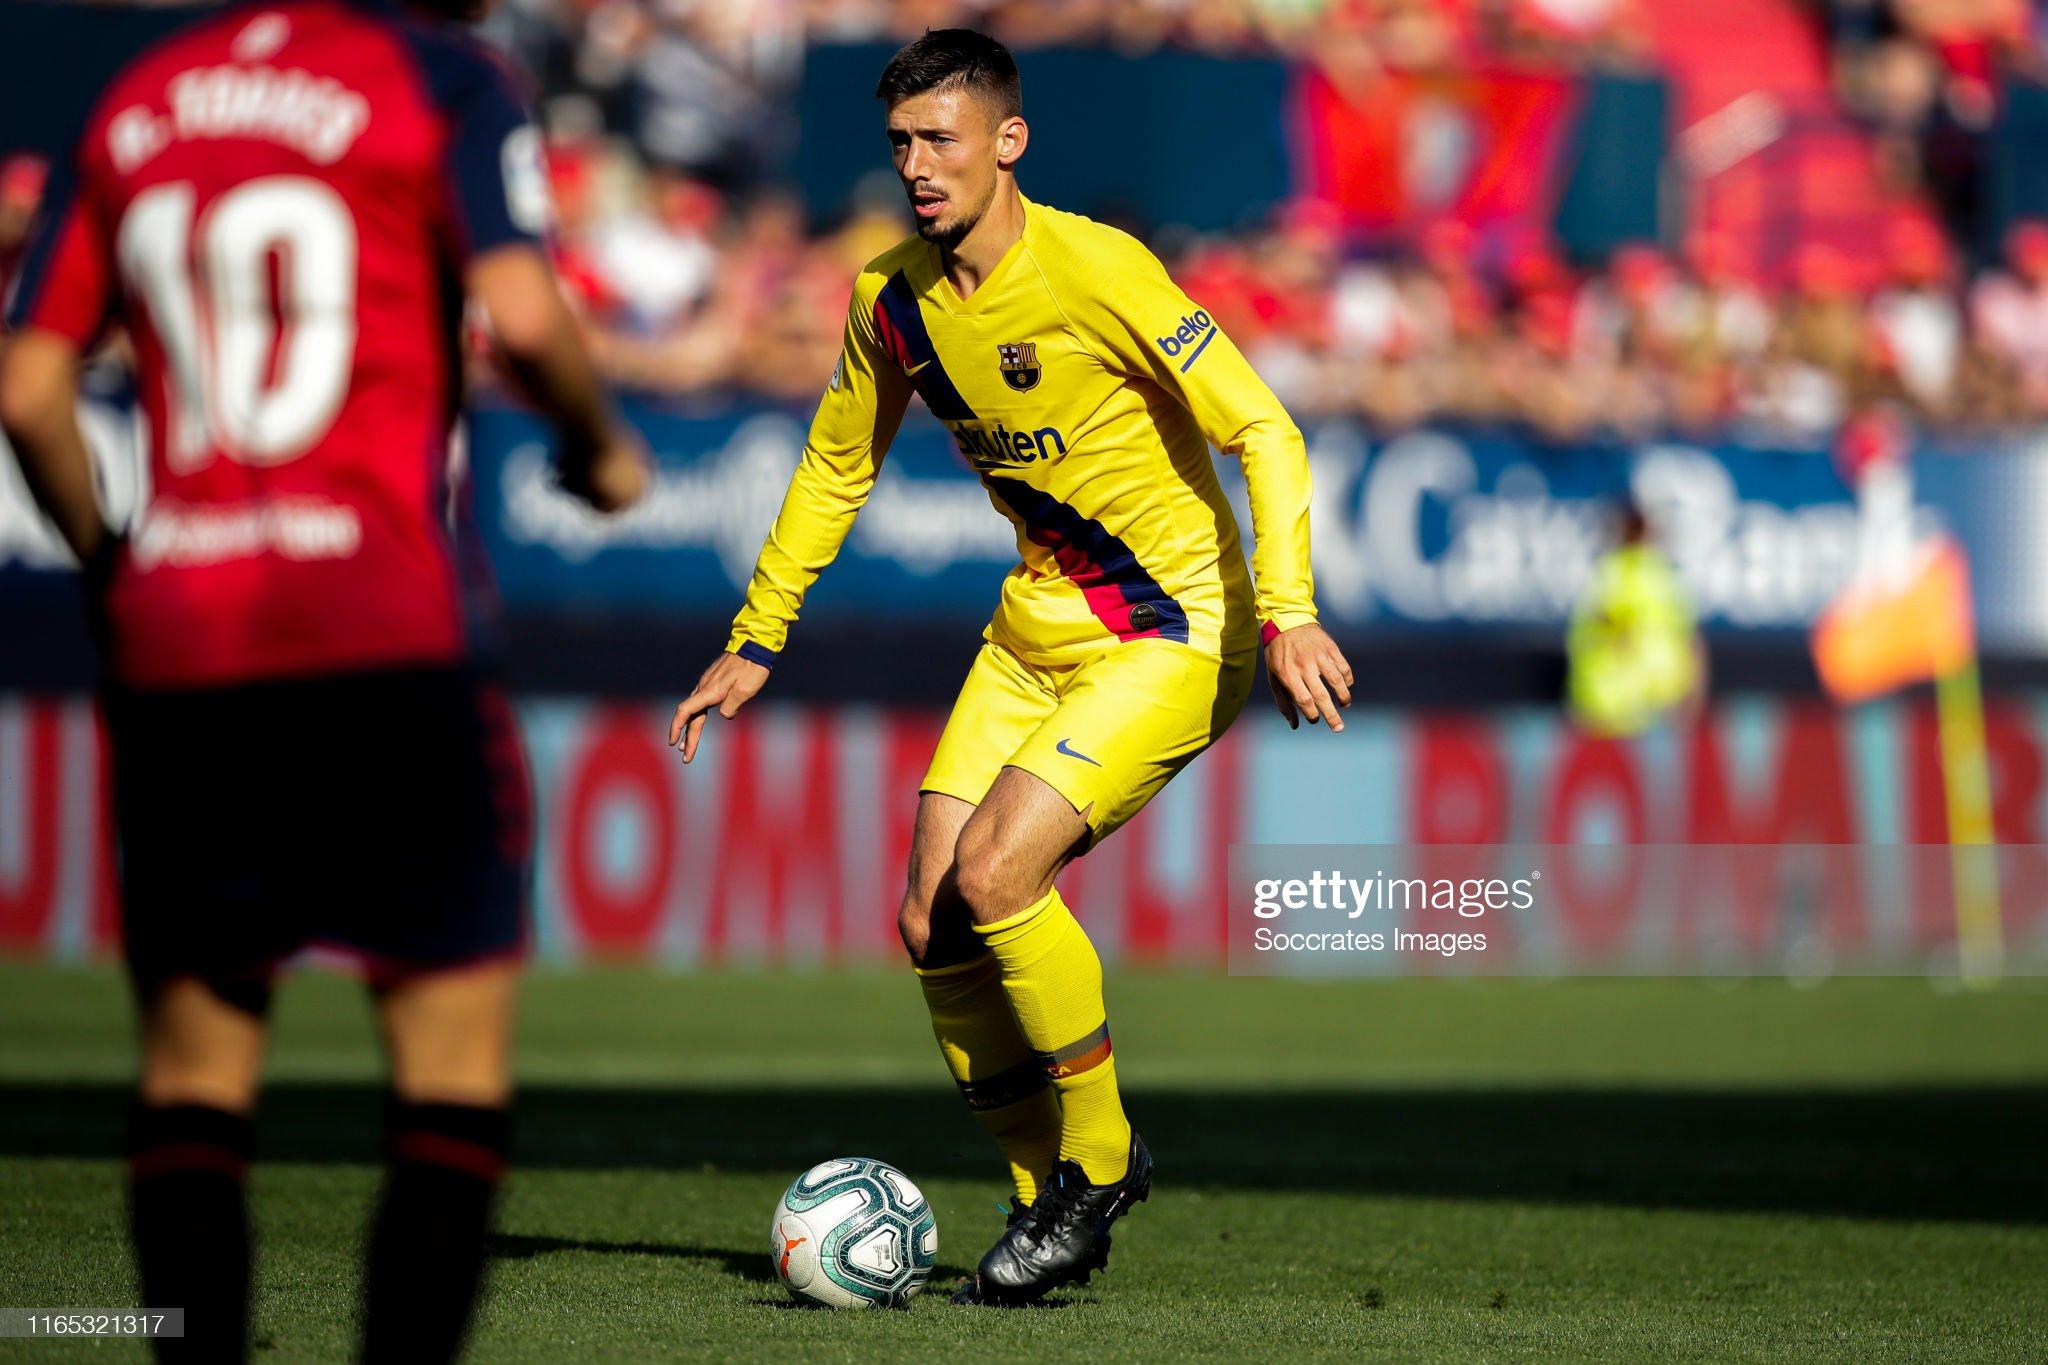 صور مباراة : أوساسونا - برشلونة 2-2 ( 31-08-2019 )  Clement-lenglet-of-fc-barcelona-during-the-la-liga-santander-match-picture-id1165321317?s=2048x2048